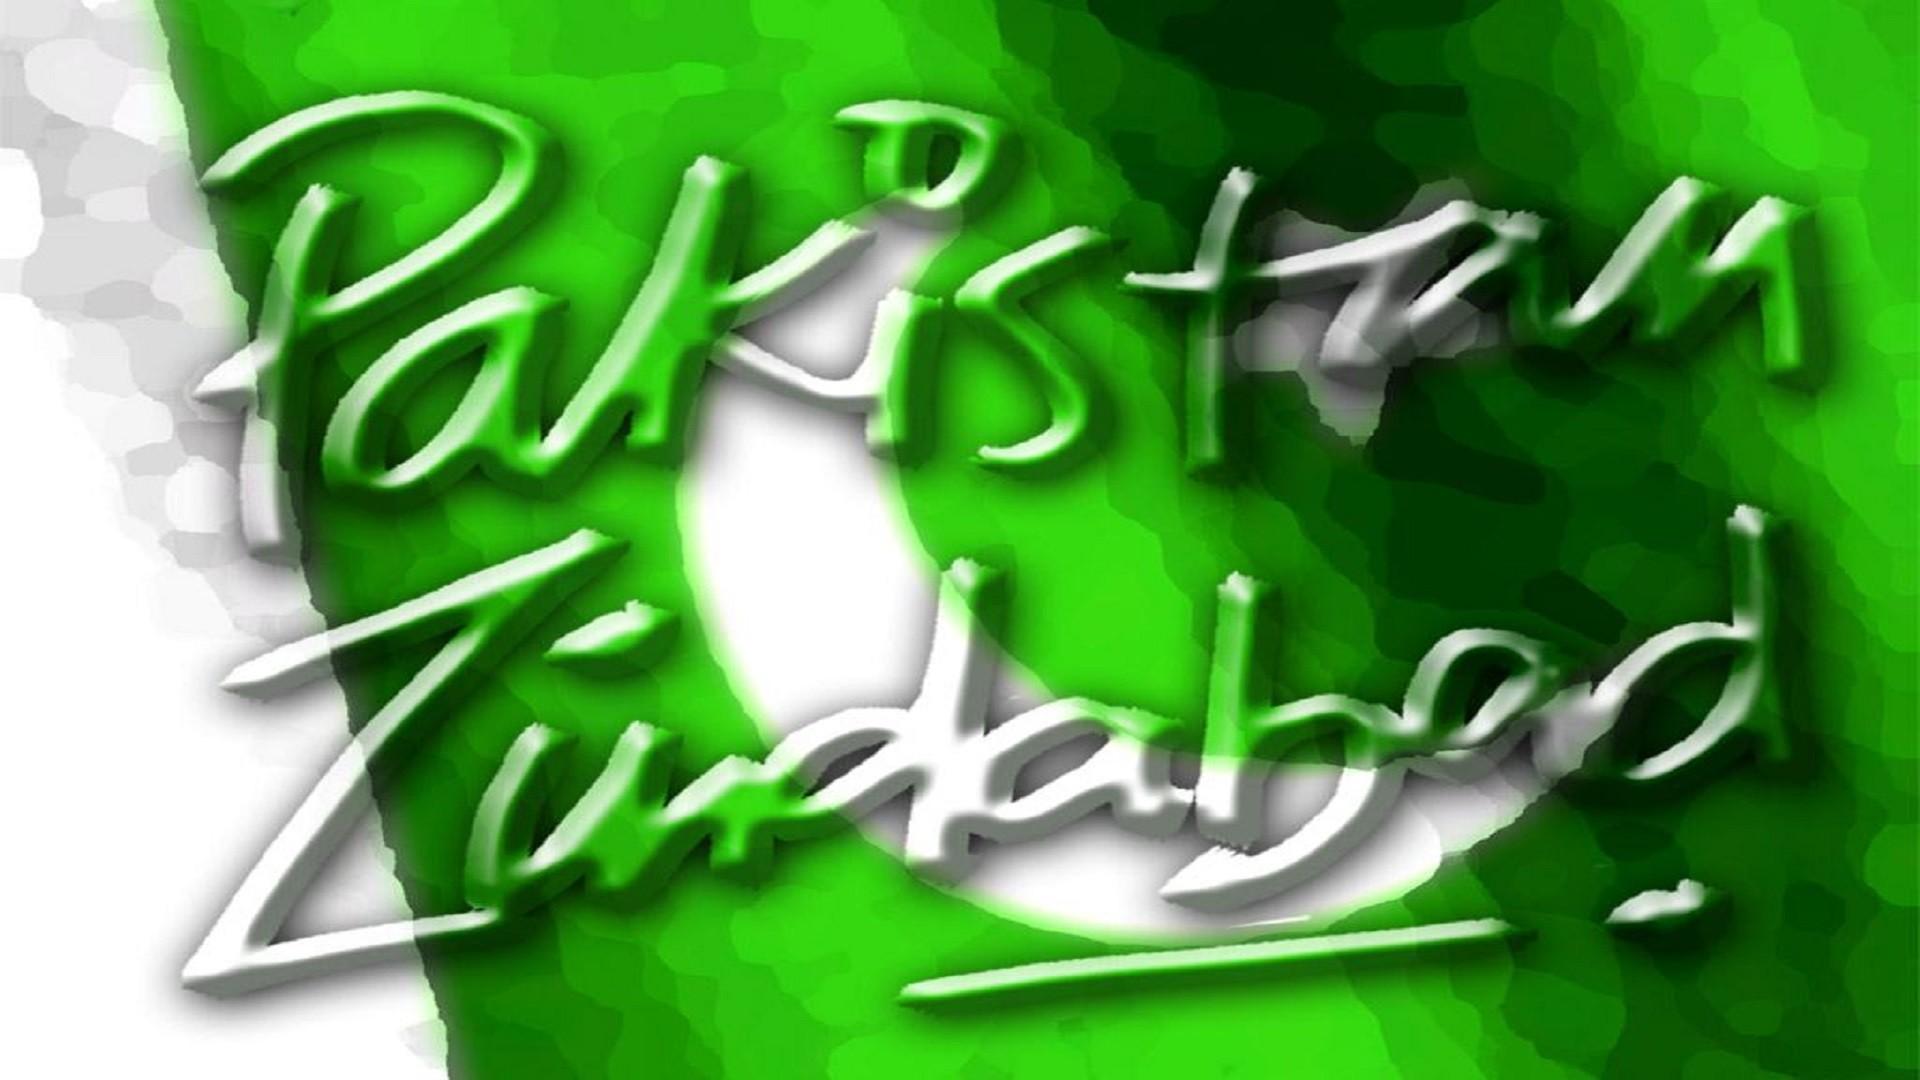 Pakistan Flag Wallpapers Hd 2014 Pakistan Flag Wallpapers Hd 2018 183 ① Wallpapertag